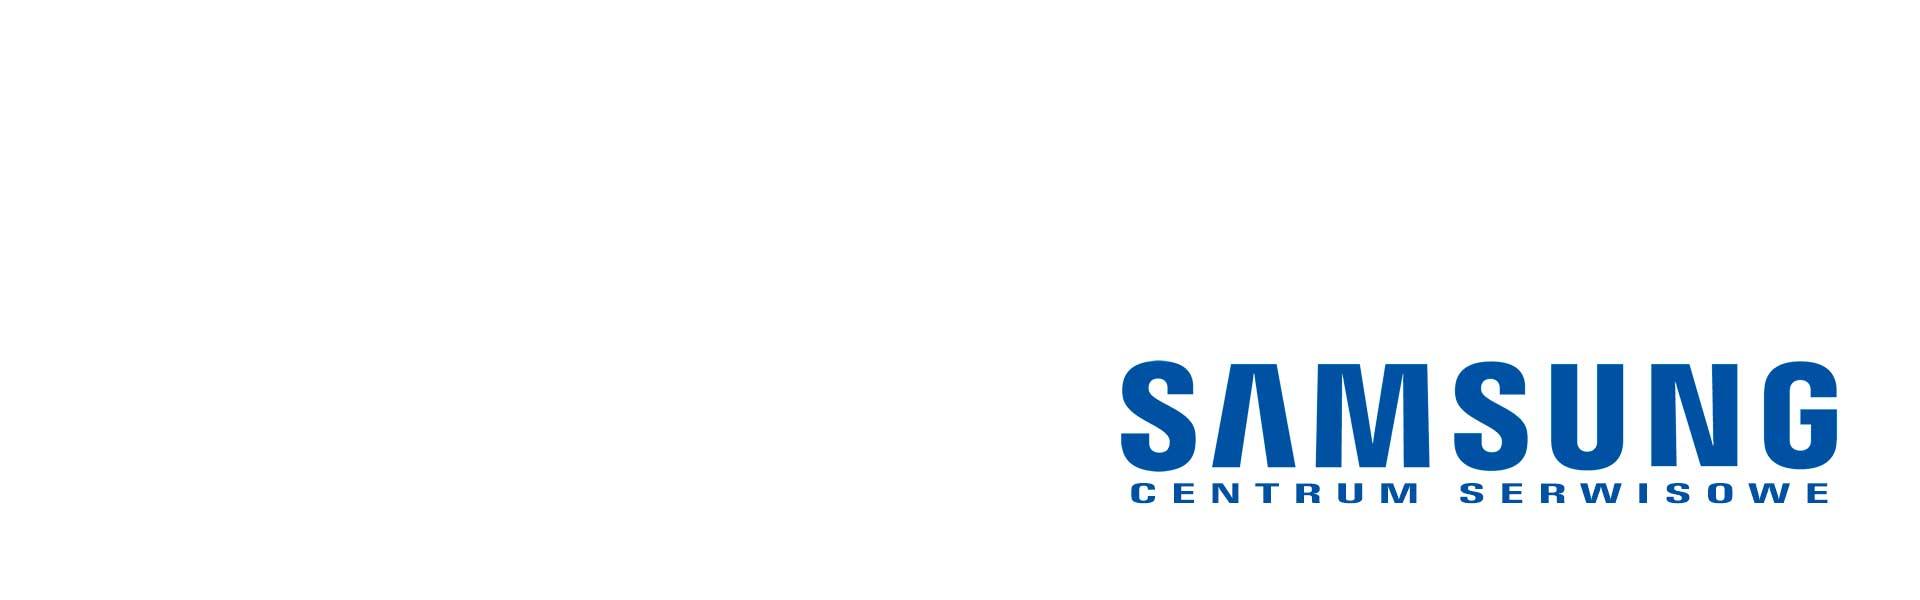 serwis-samsung-krakow | Serwis RTV AGD, Centrum Serwisowe ...